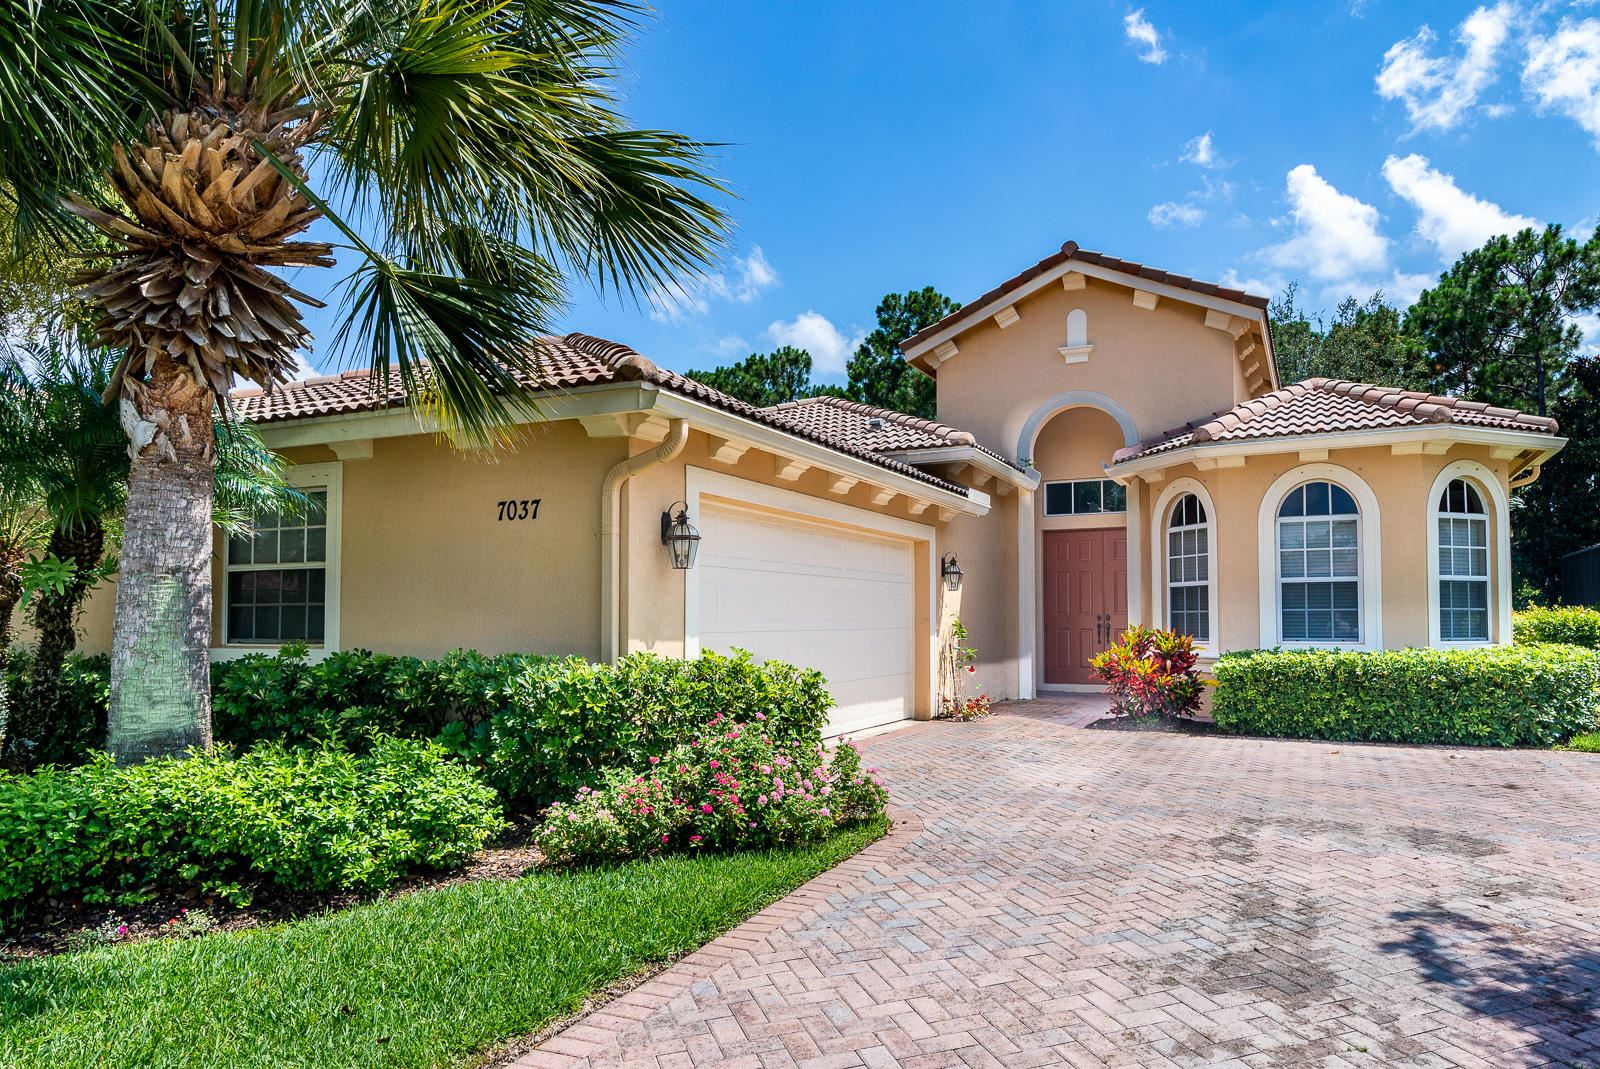 7037 Maidstone Drive, Port Saint Lucie, FL 34986 - #: RX-10629720